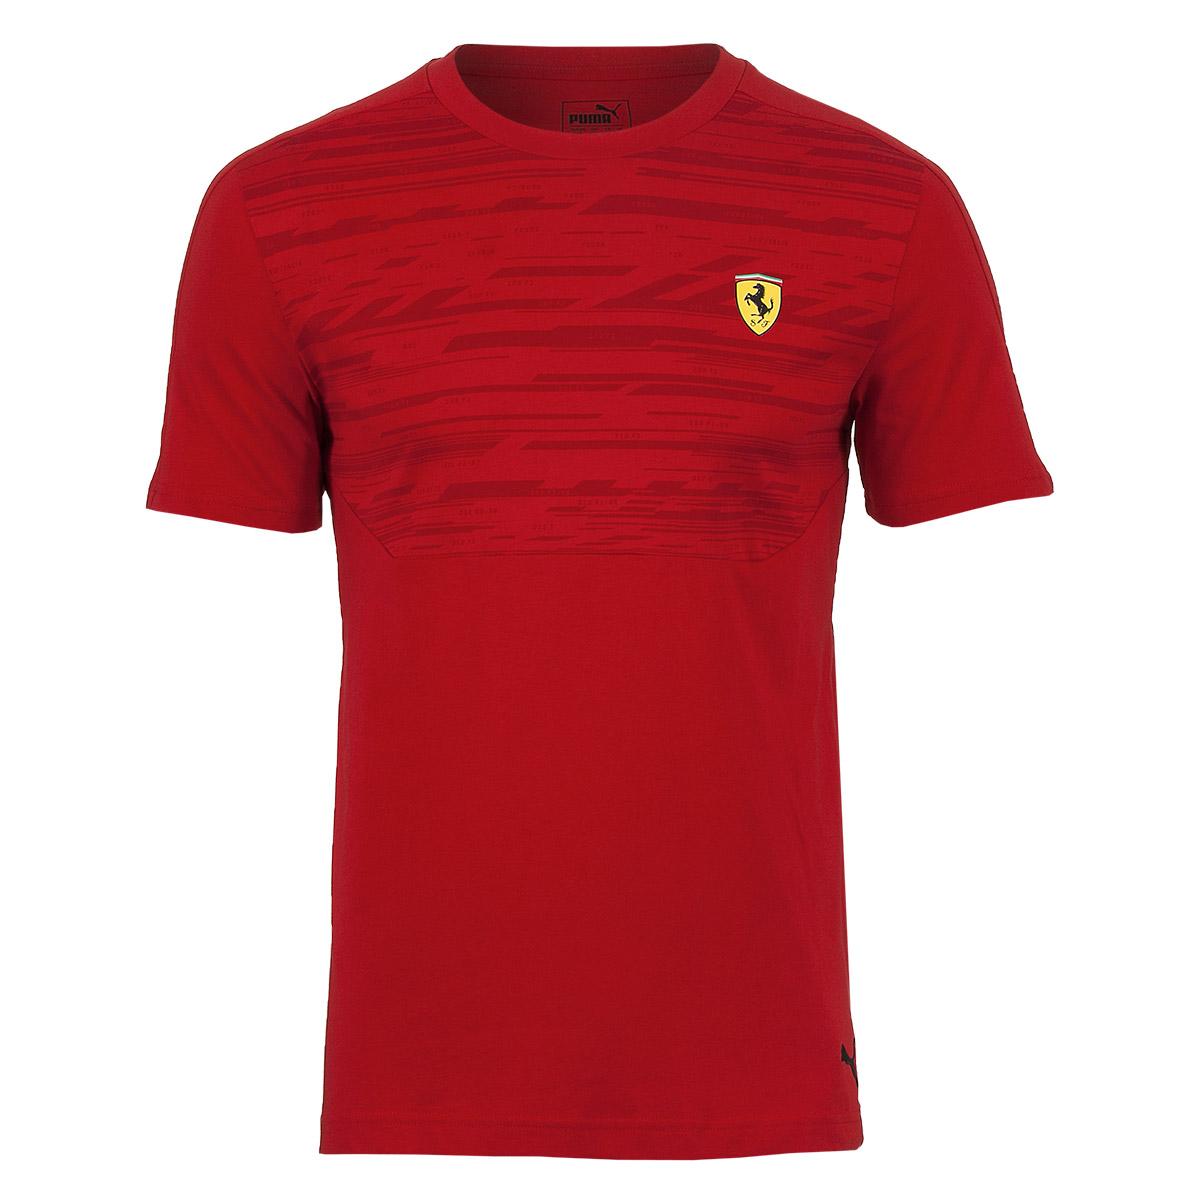 Camiseta Masc. Puma Styfr Scuderia Ferrari Tee - Vermelho